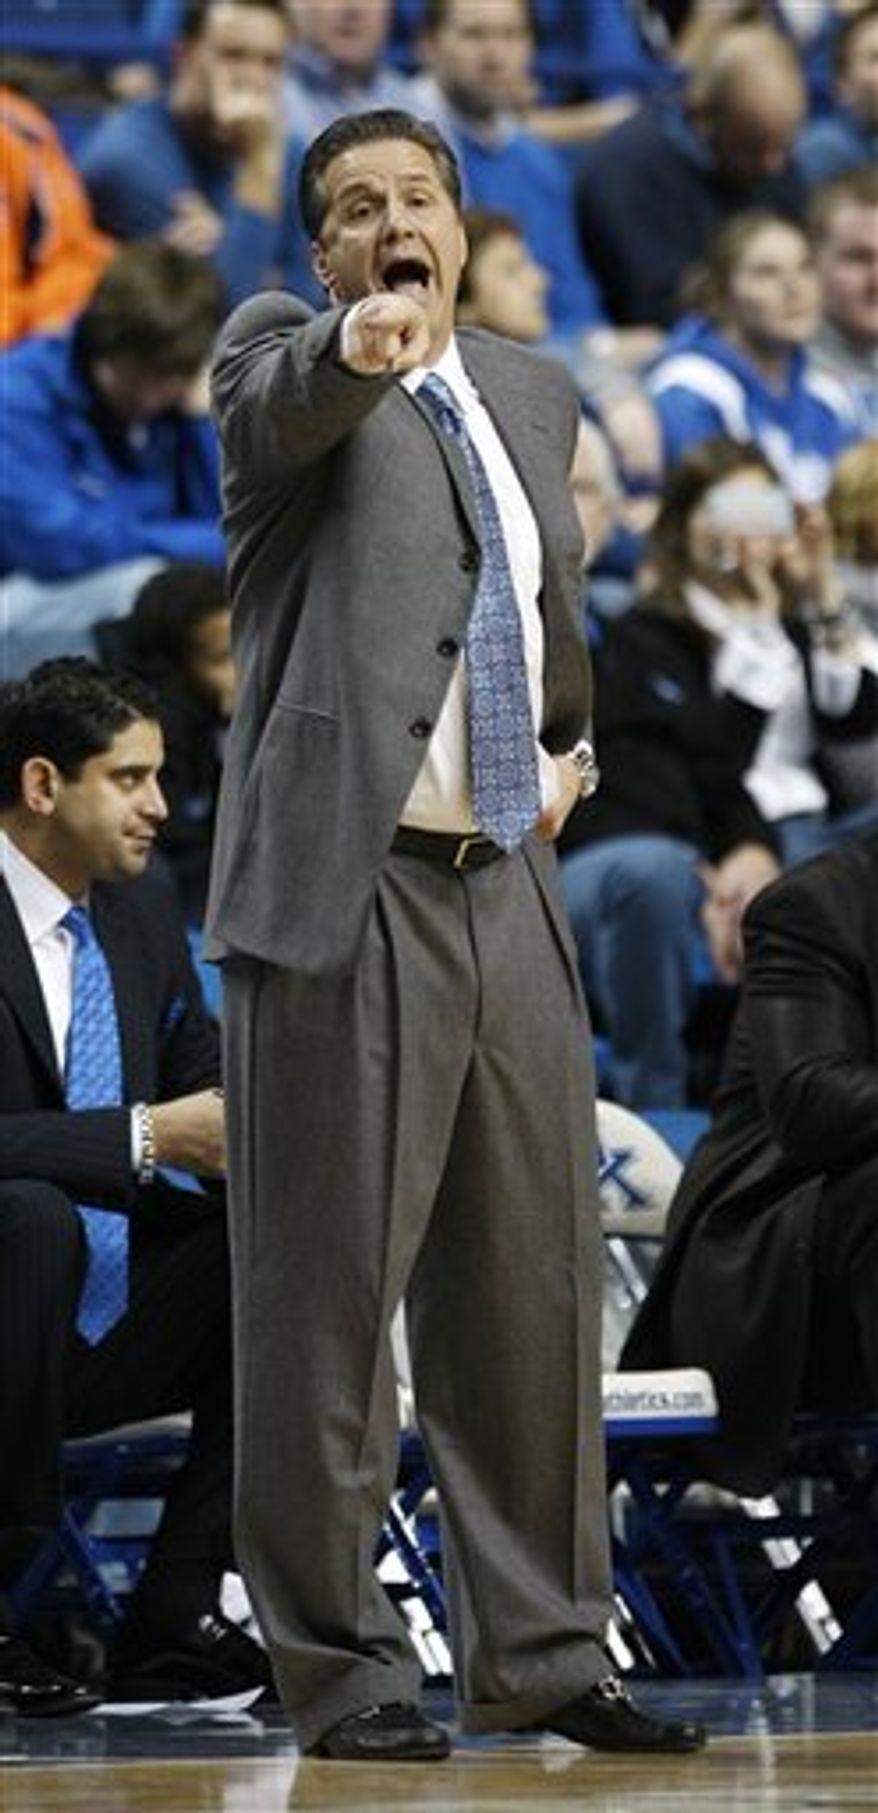 Kentucky coach John Calipari yells to his players during the first half of their NCAA college basketball game against Auburn in Lexington, Ky., Tuesday, Jan. 11, 2011.  (AP Photo/Ed Reinke)